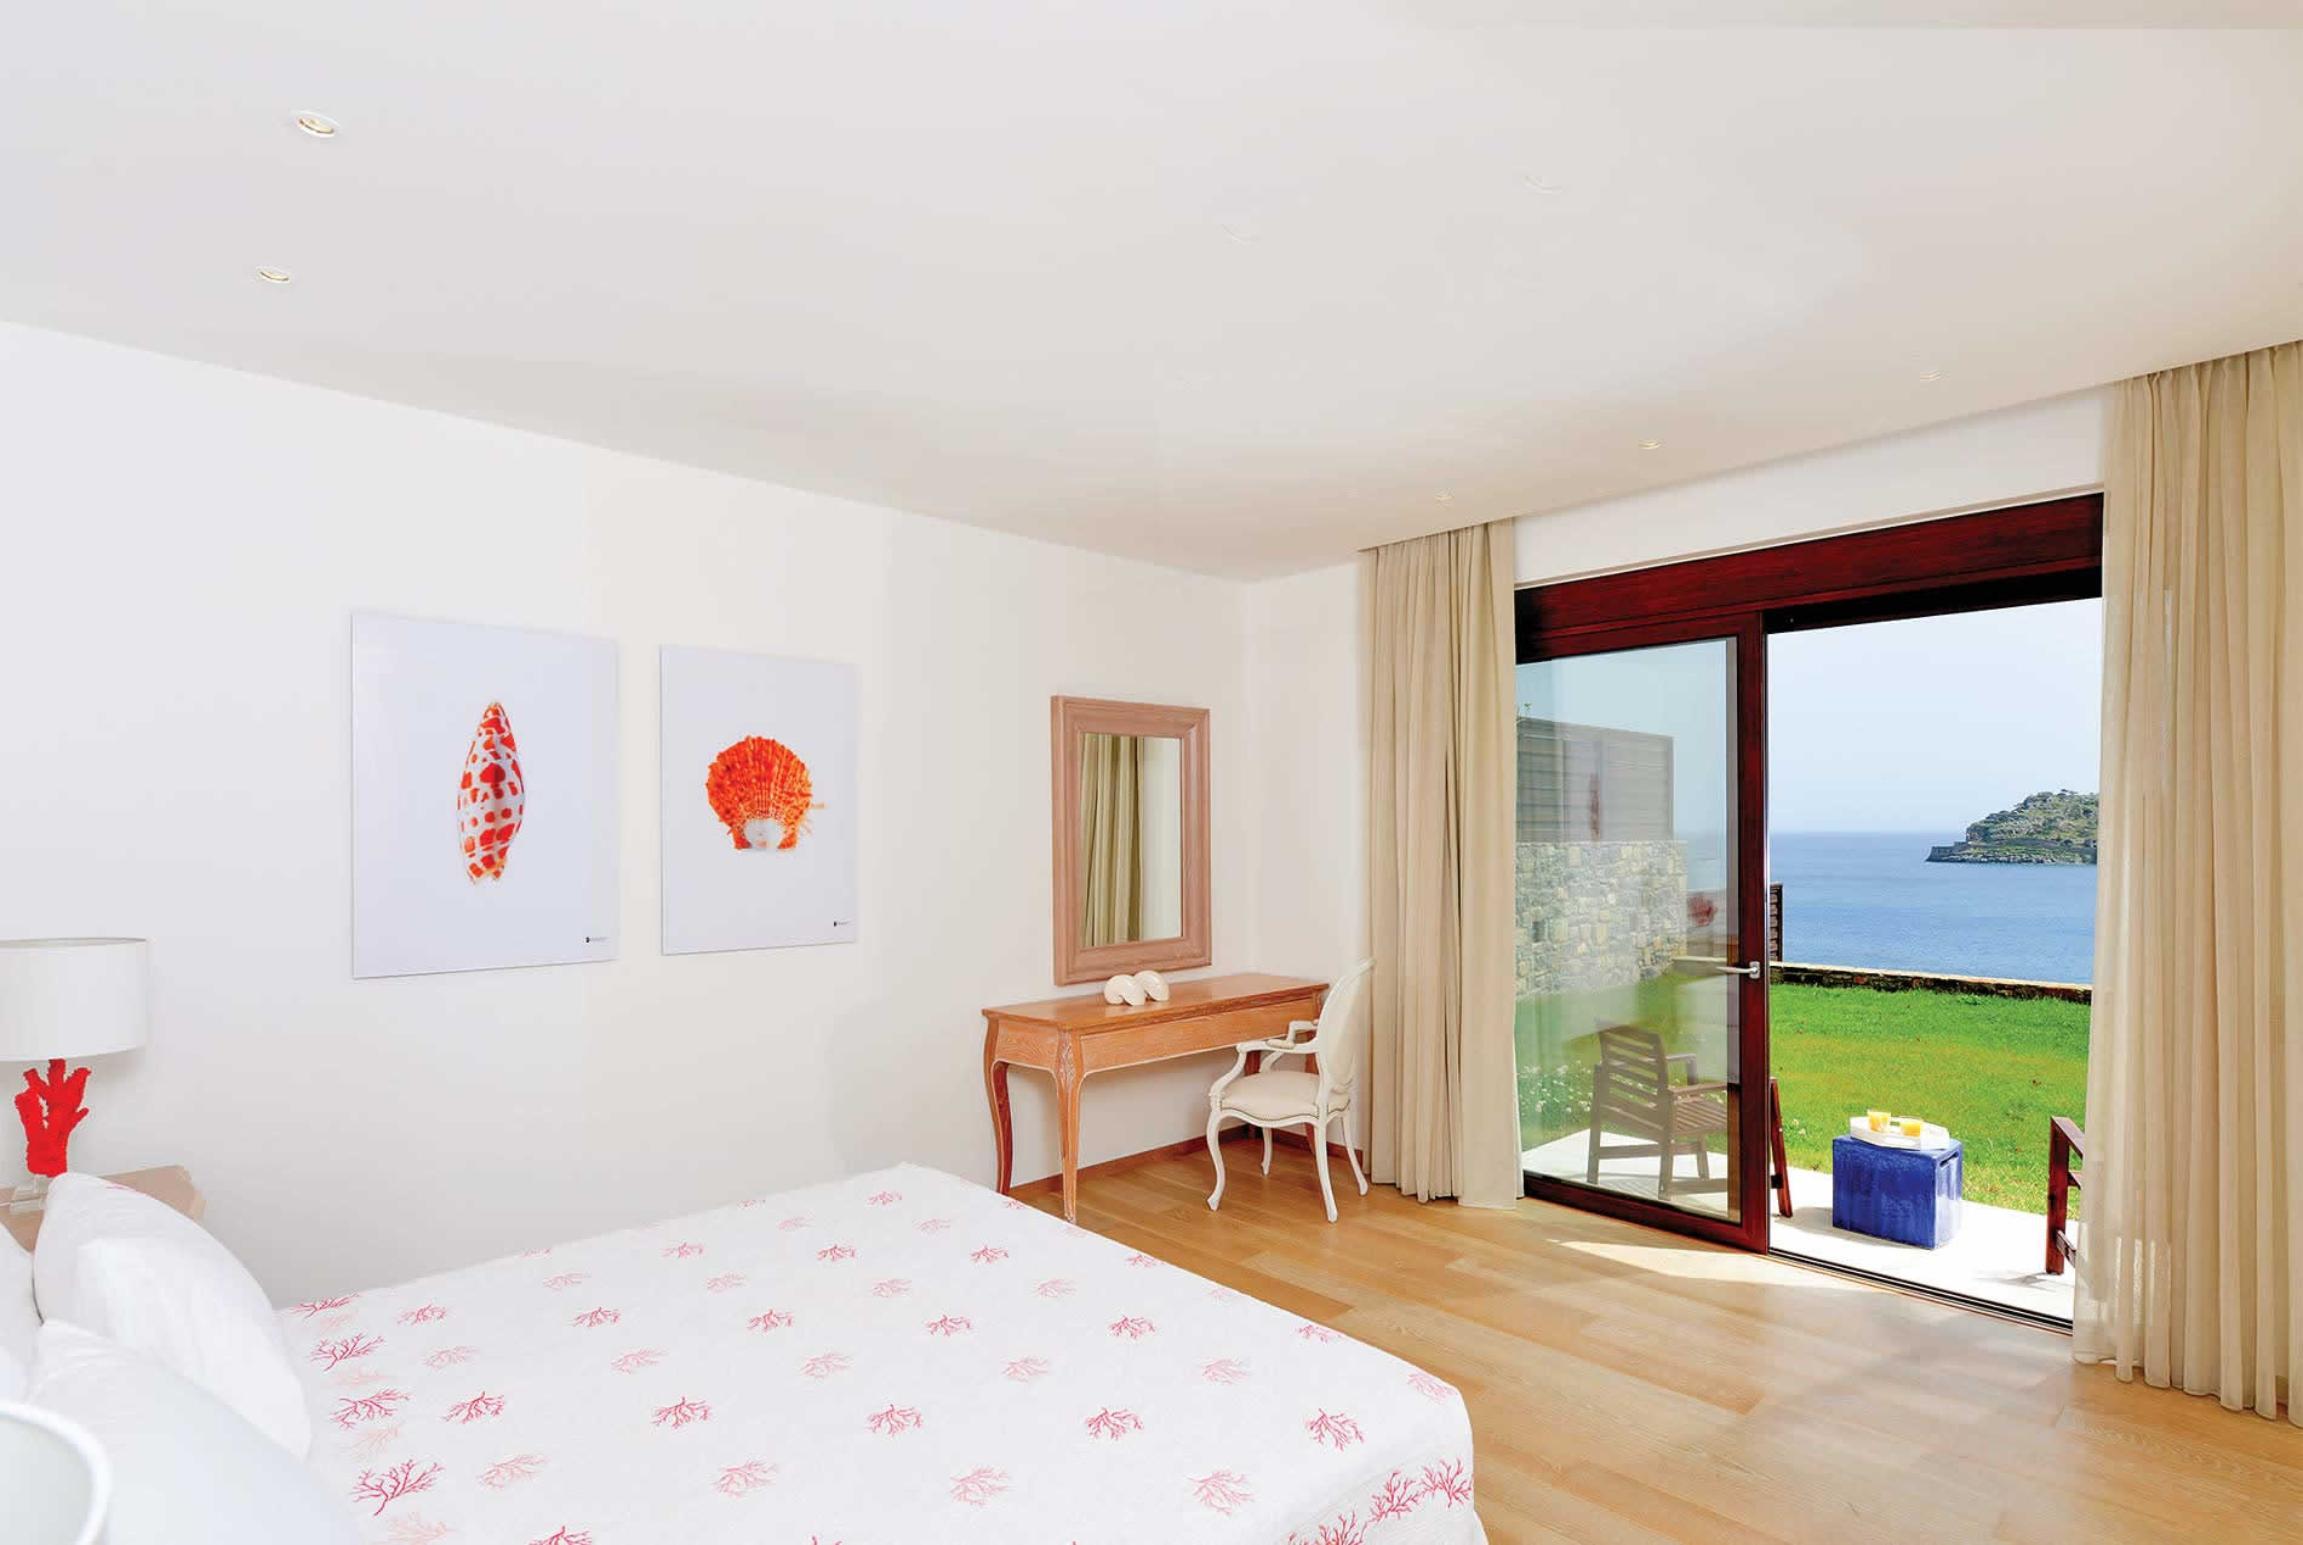 Ferienhaus Danae (2654195), Plaka, Kreta Nordküste, Kreta, Griechenland, Bild 7